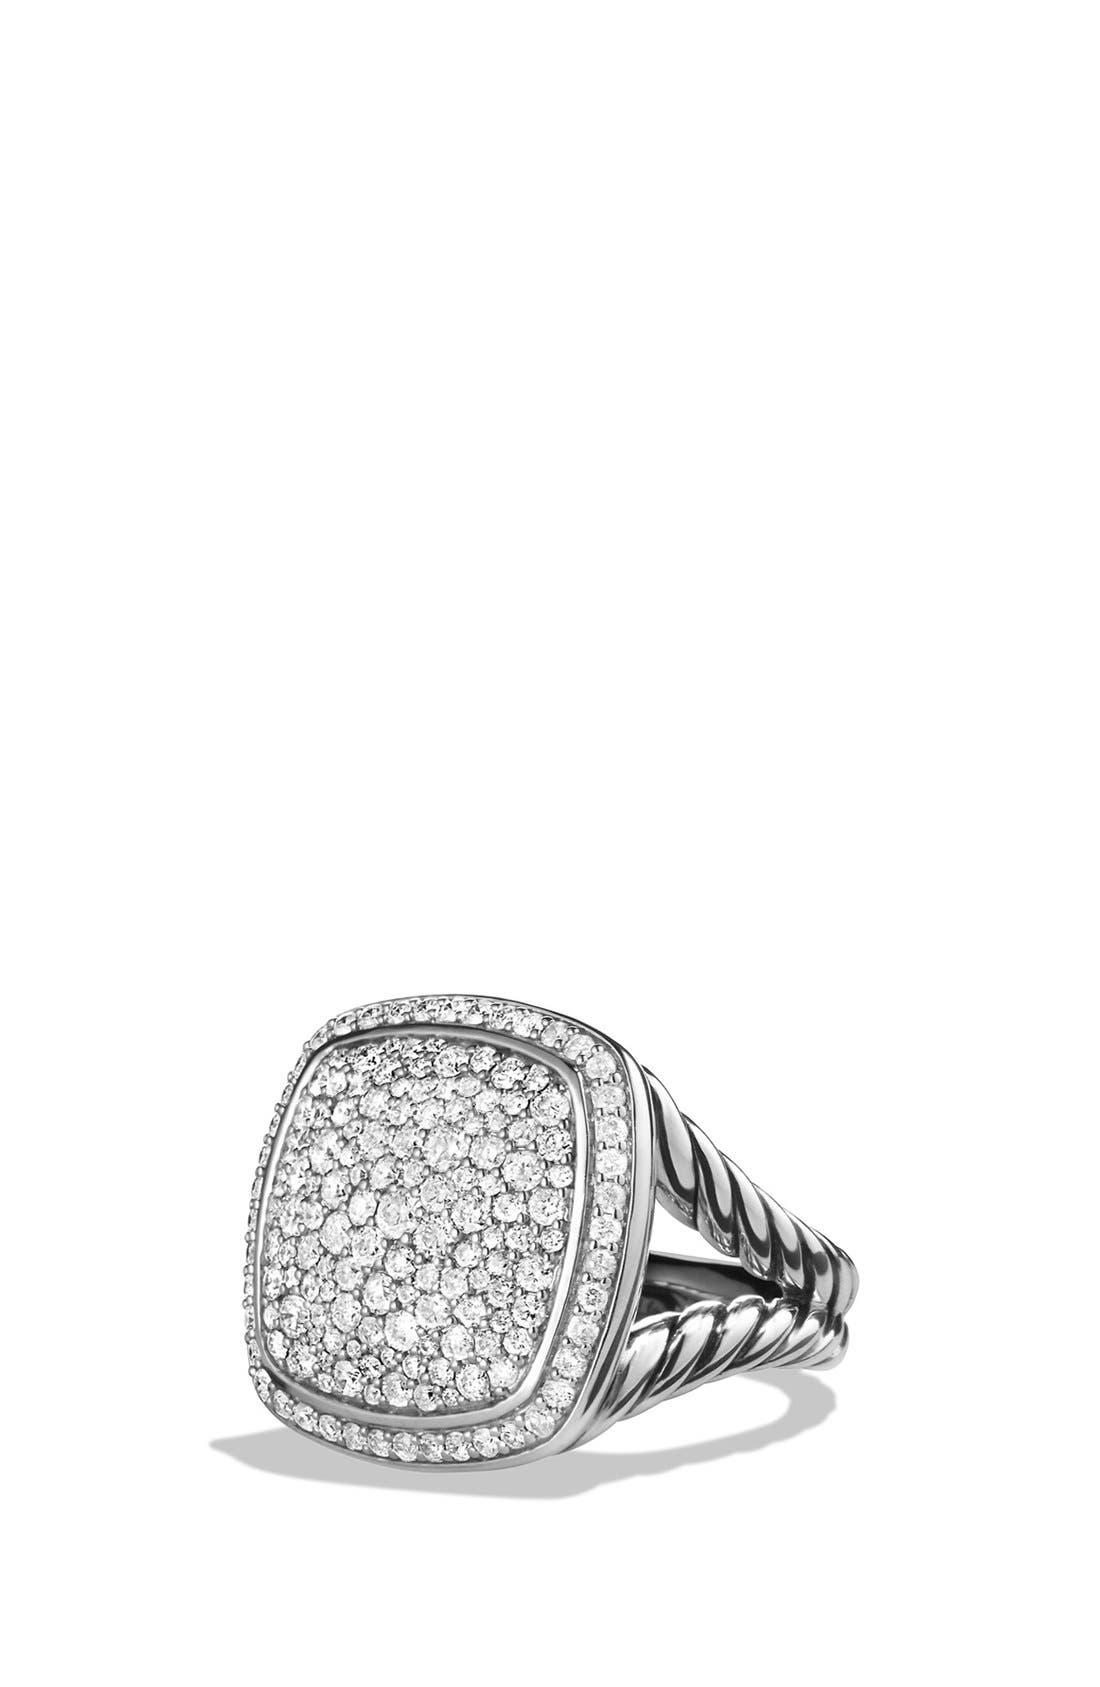 Albion Ring with Diamonds,                             Main thumbnail 1, color,                             DIAMOND